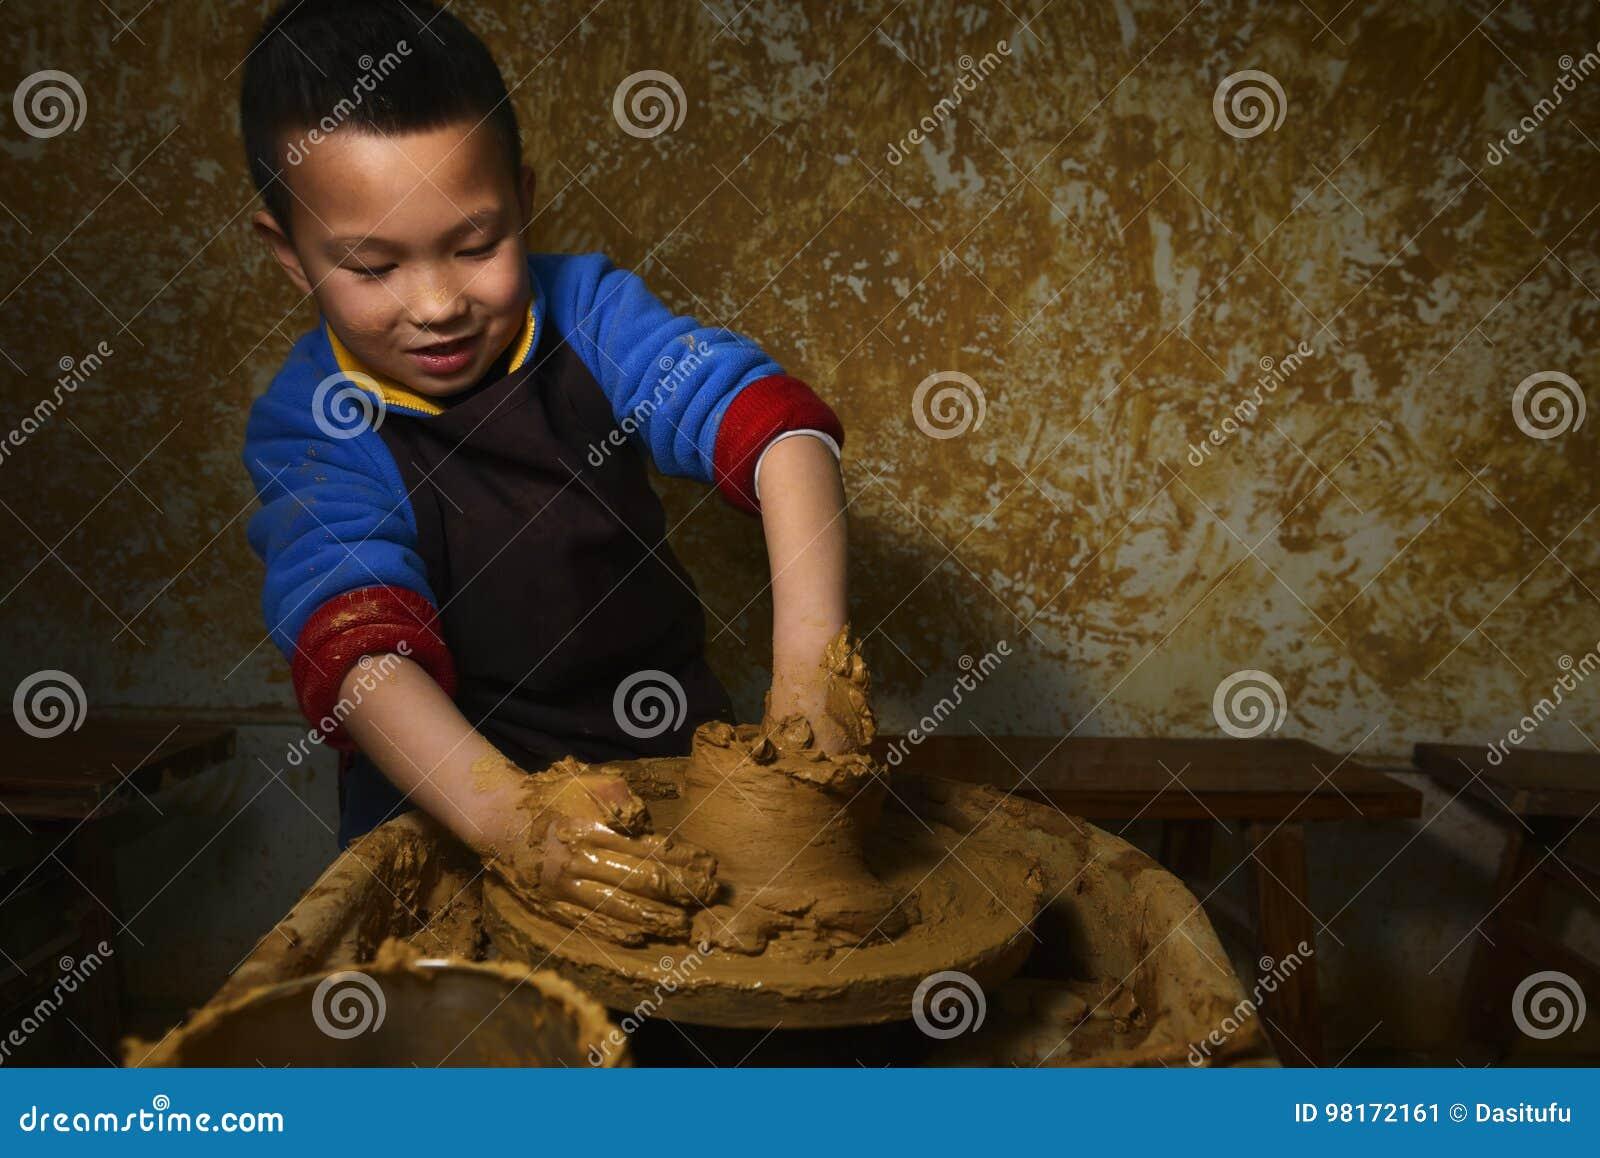 Kid making pottery